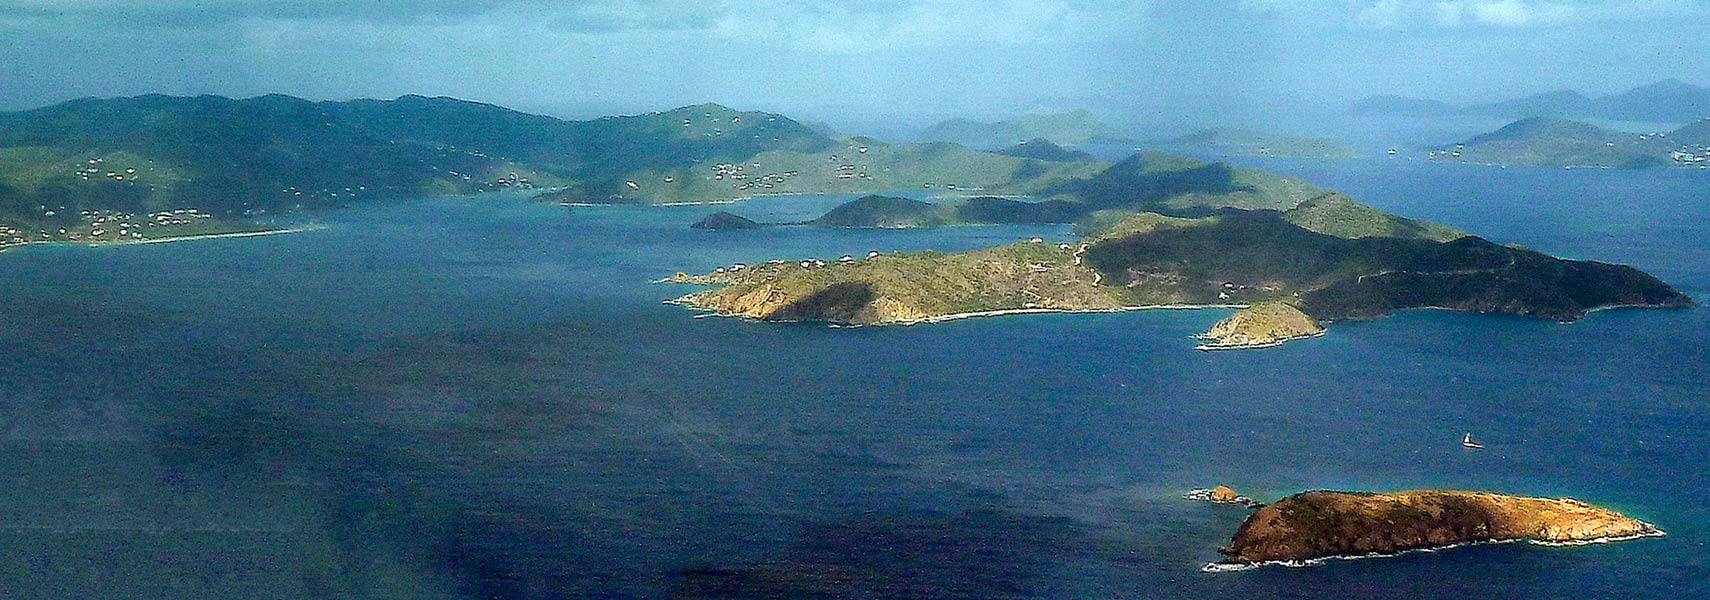 Aerial View Of St John British Virgin Islands